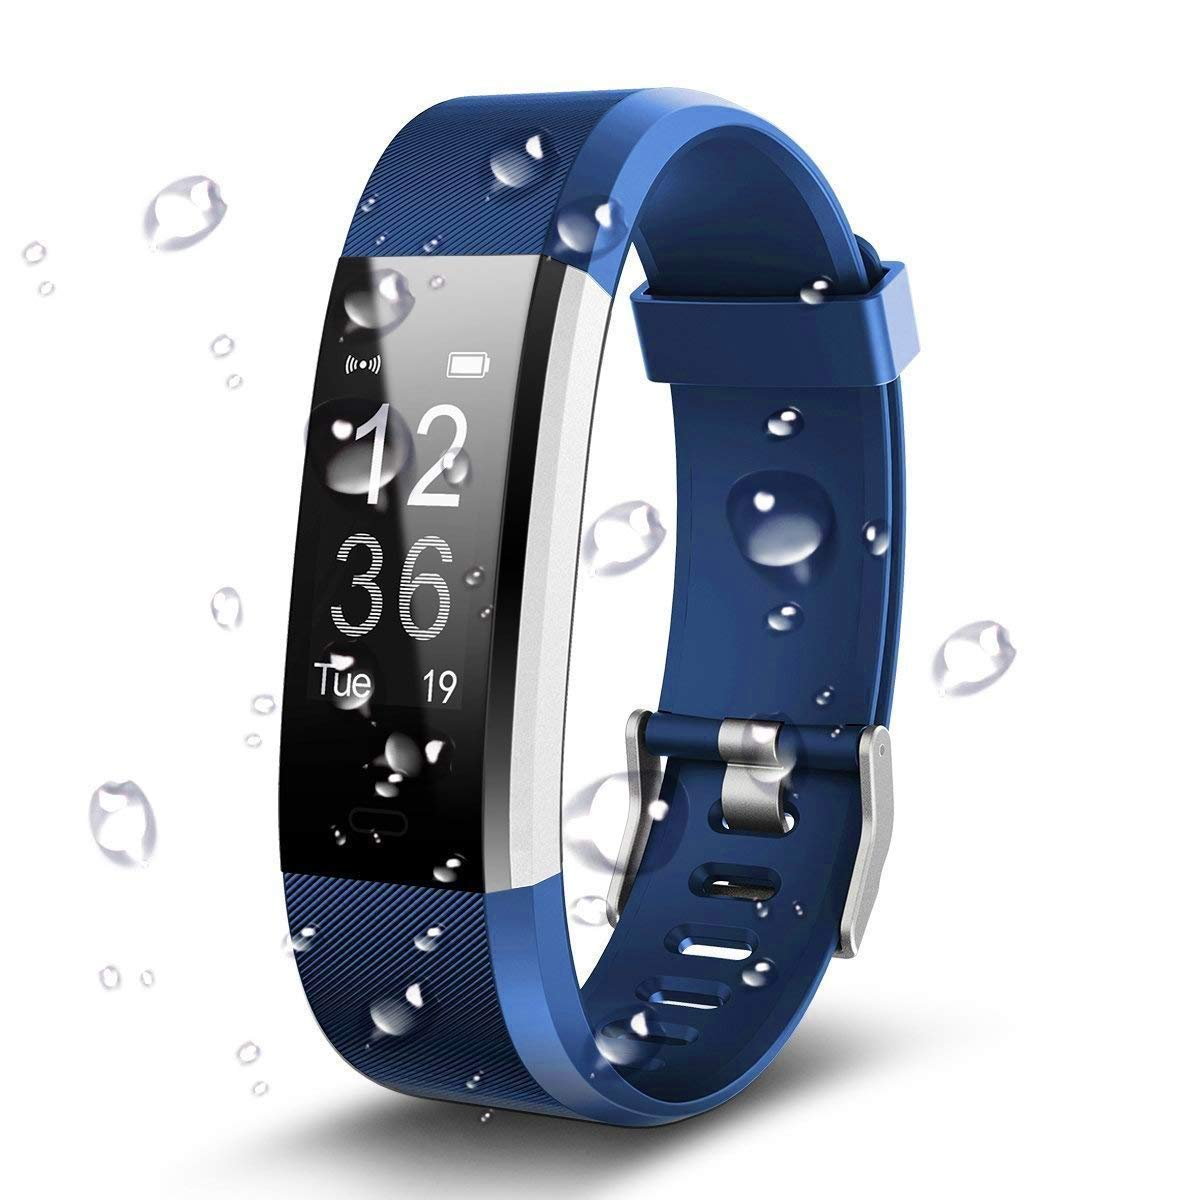 Antimi Fitness Armband, Wasserdicht IP67 Fitness Tracker, Pulsuhren, Schrittzähler, Kamerasteuerung, Vibrationsalarm Anruf SMS Whatsapp Beachten kompatibel mit iPhone Android Handy Schrittzähler Antimi-115P